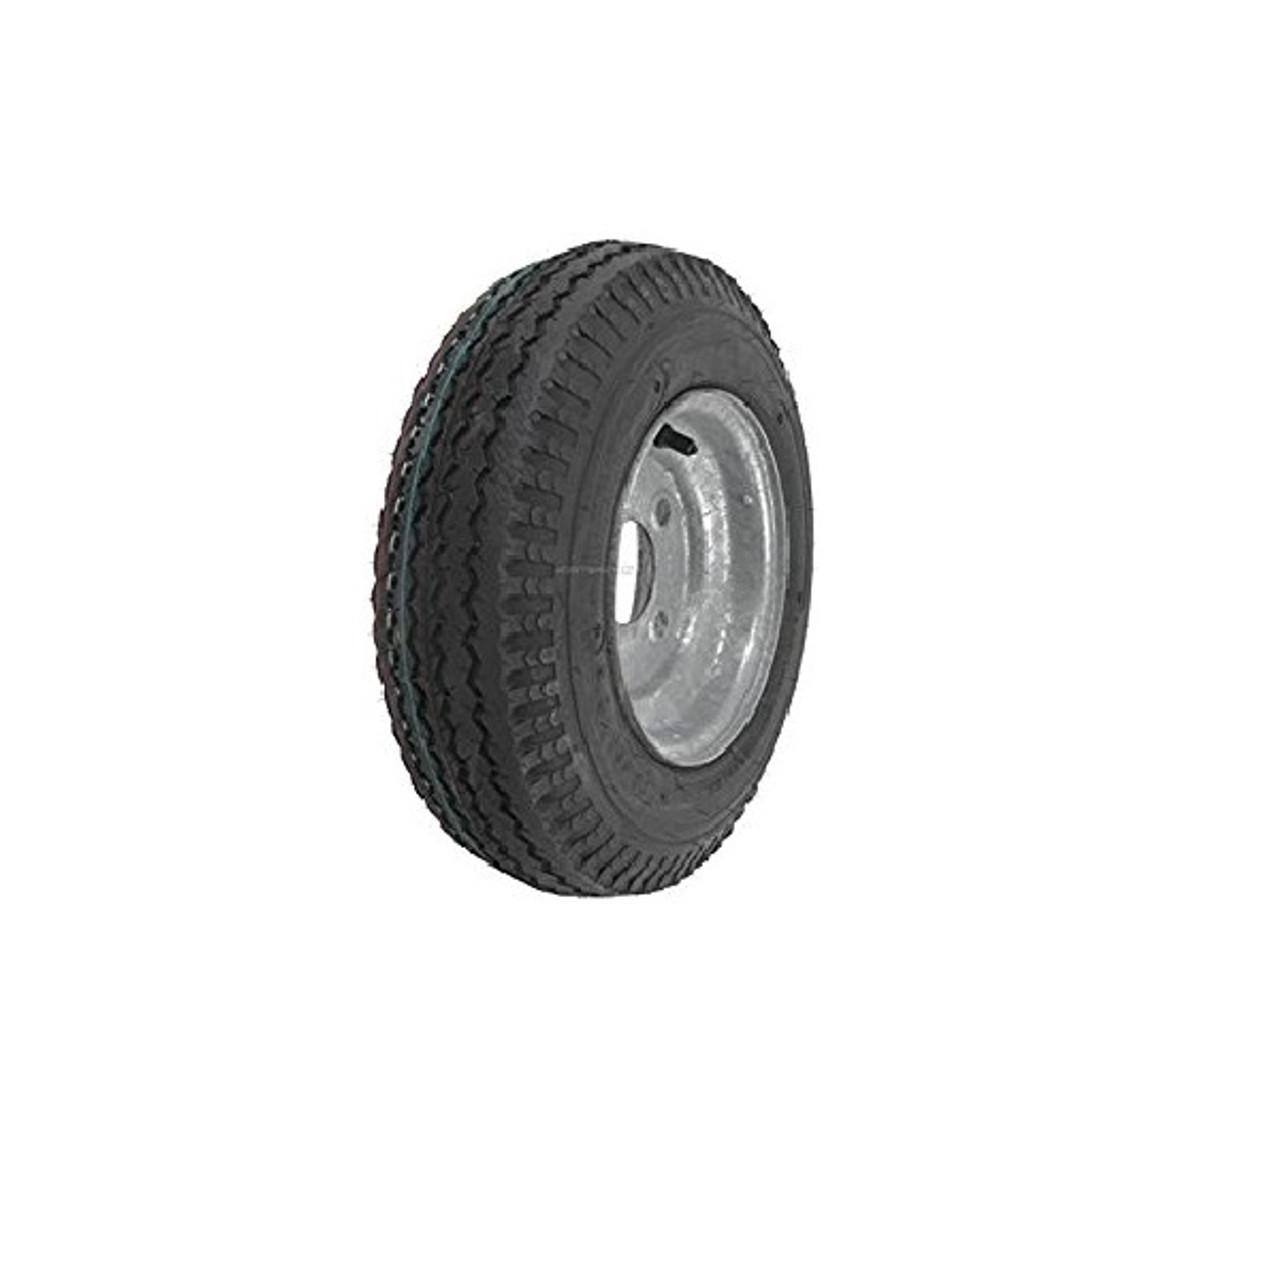 Trailer Tire On Rim 480-12 4.80-12 LRC Bias 5 Lug Galvanized Spoke